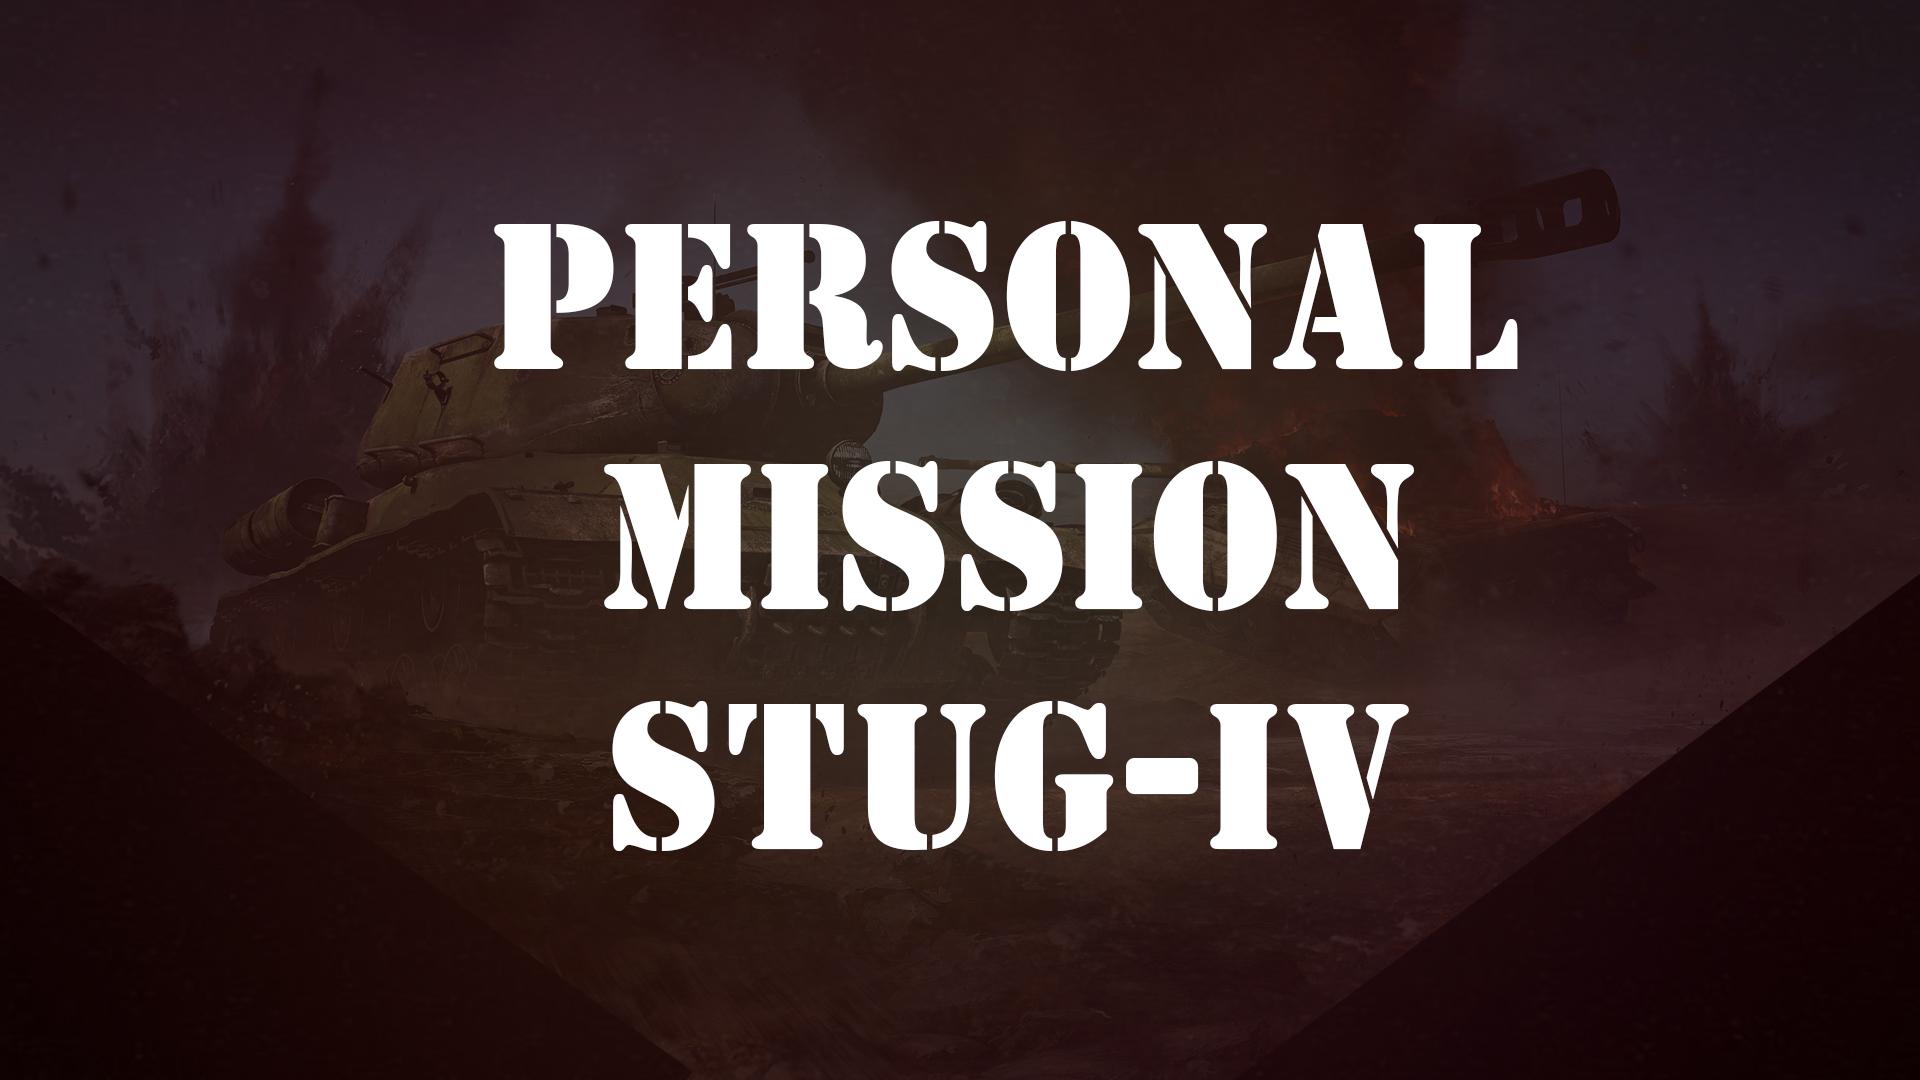 Personal mission StuG IV